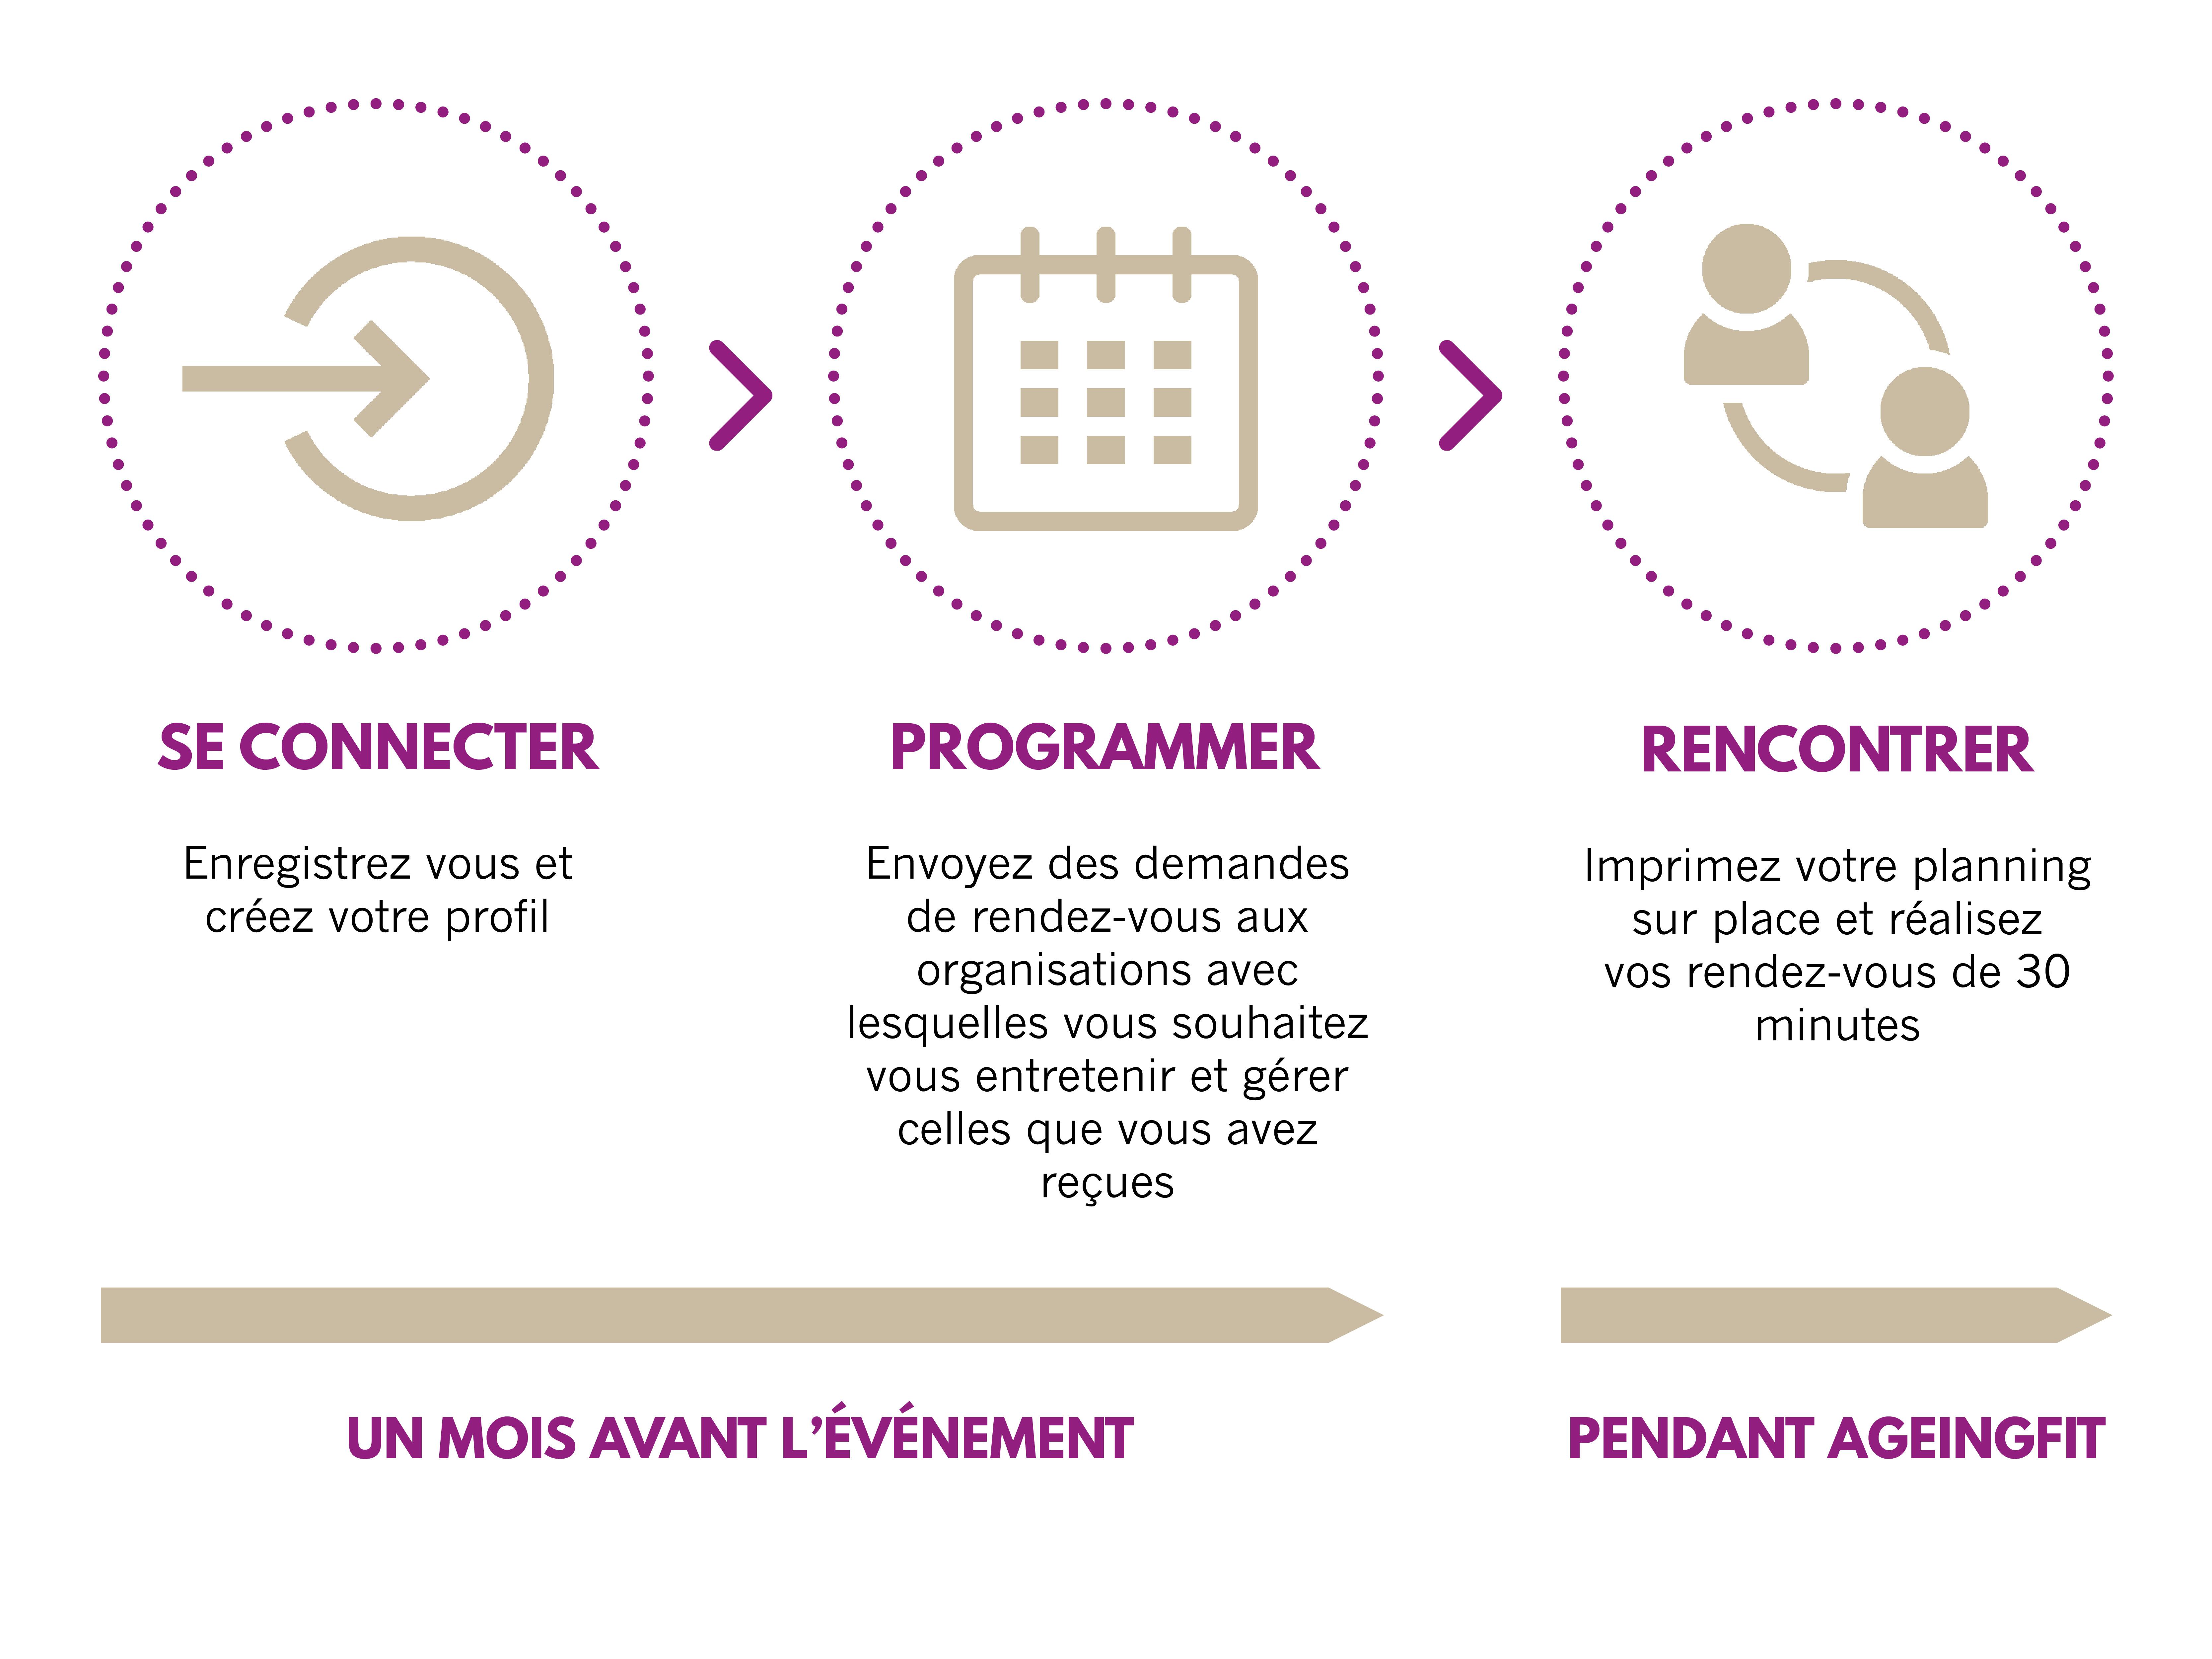 visuel-plateforme-de-networking